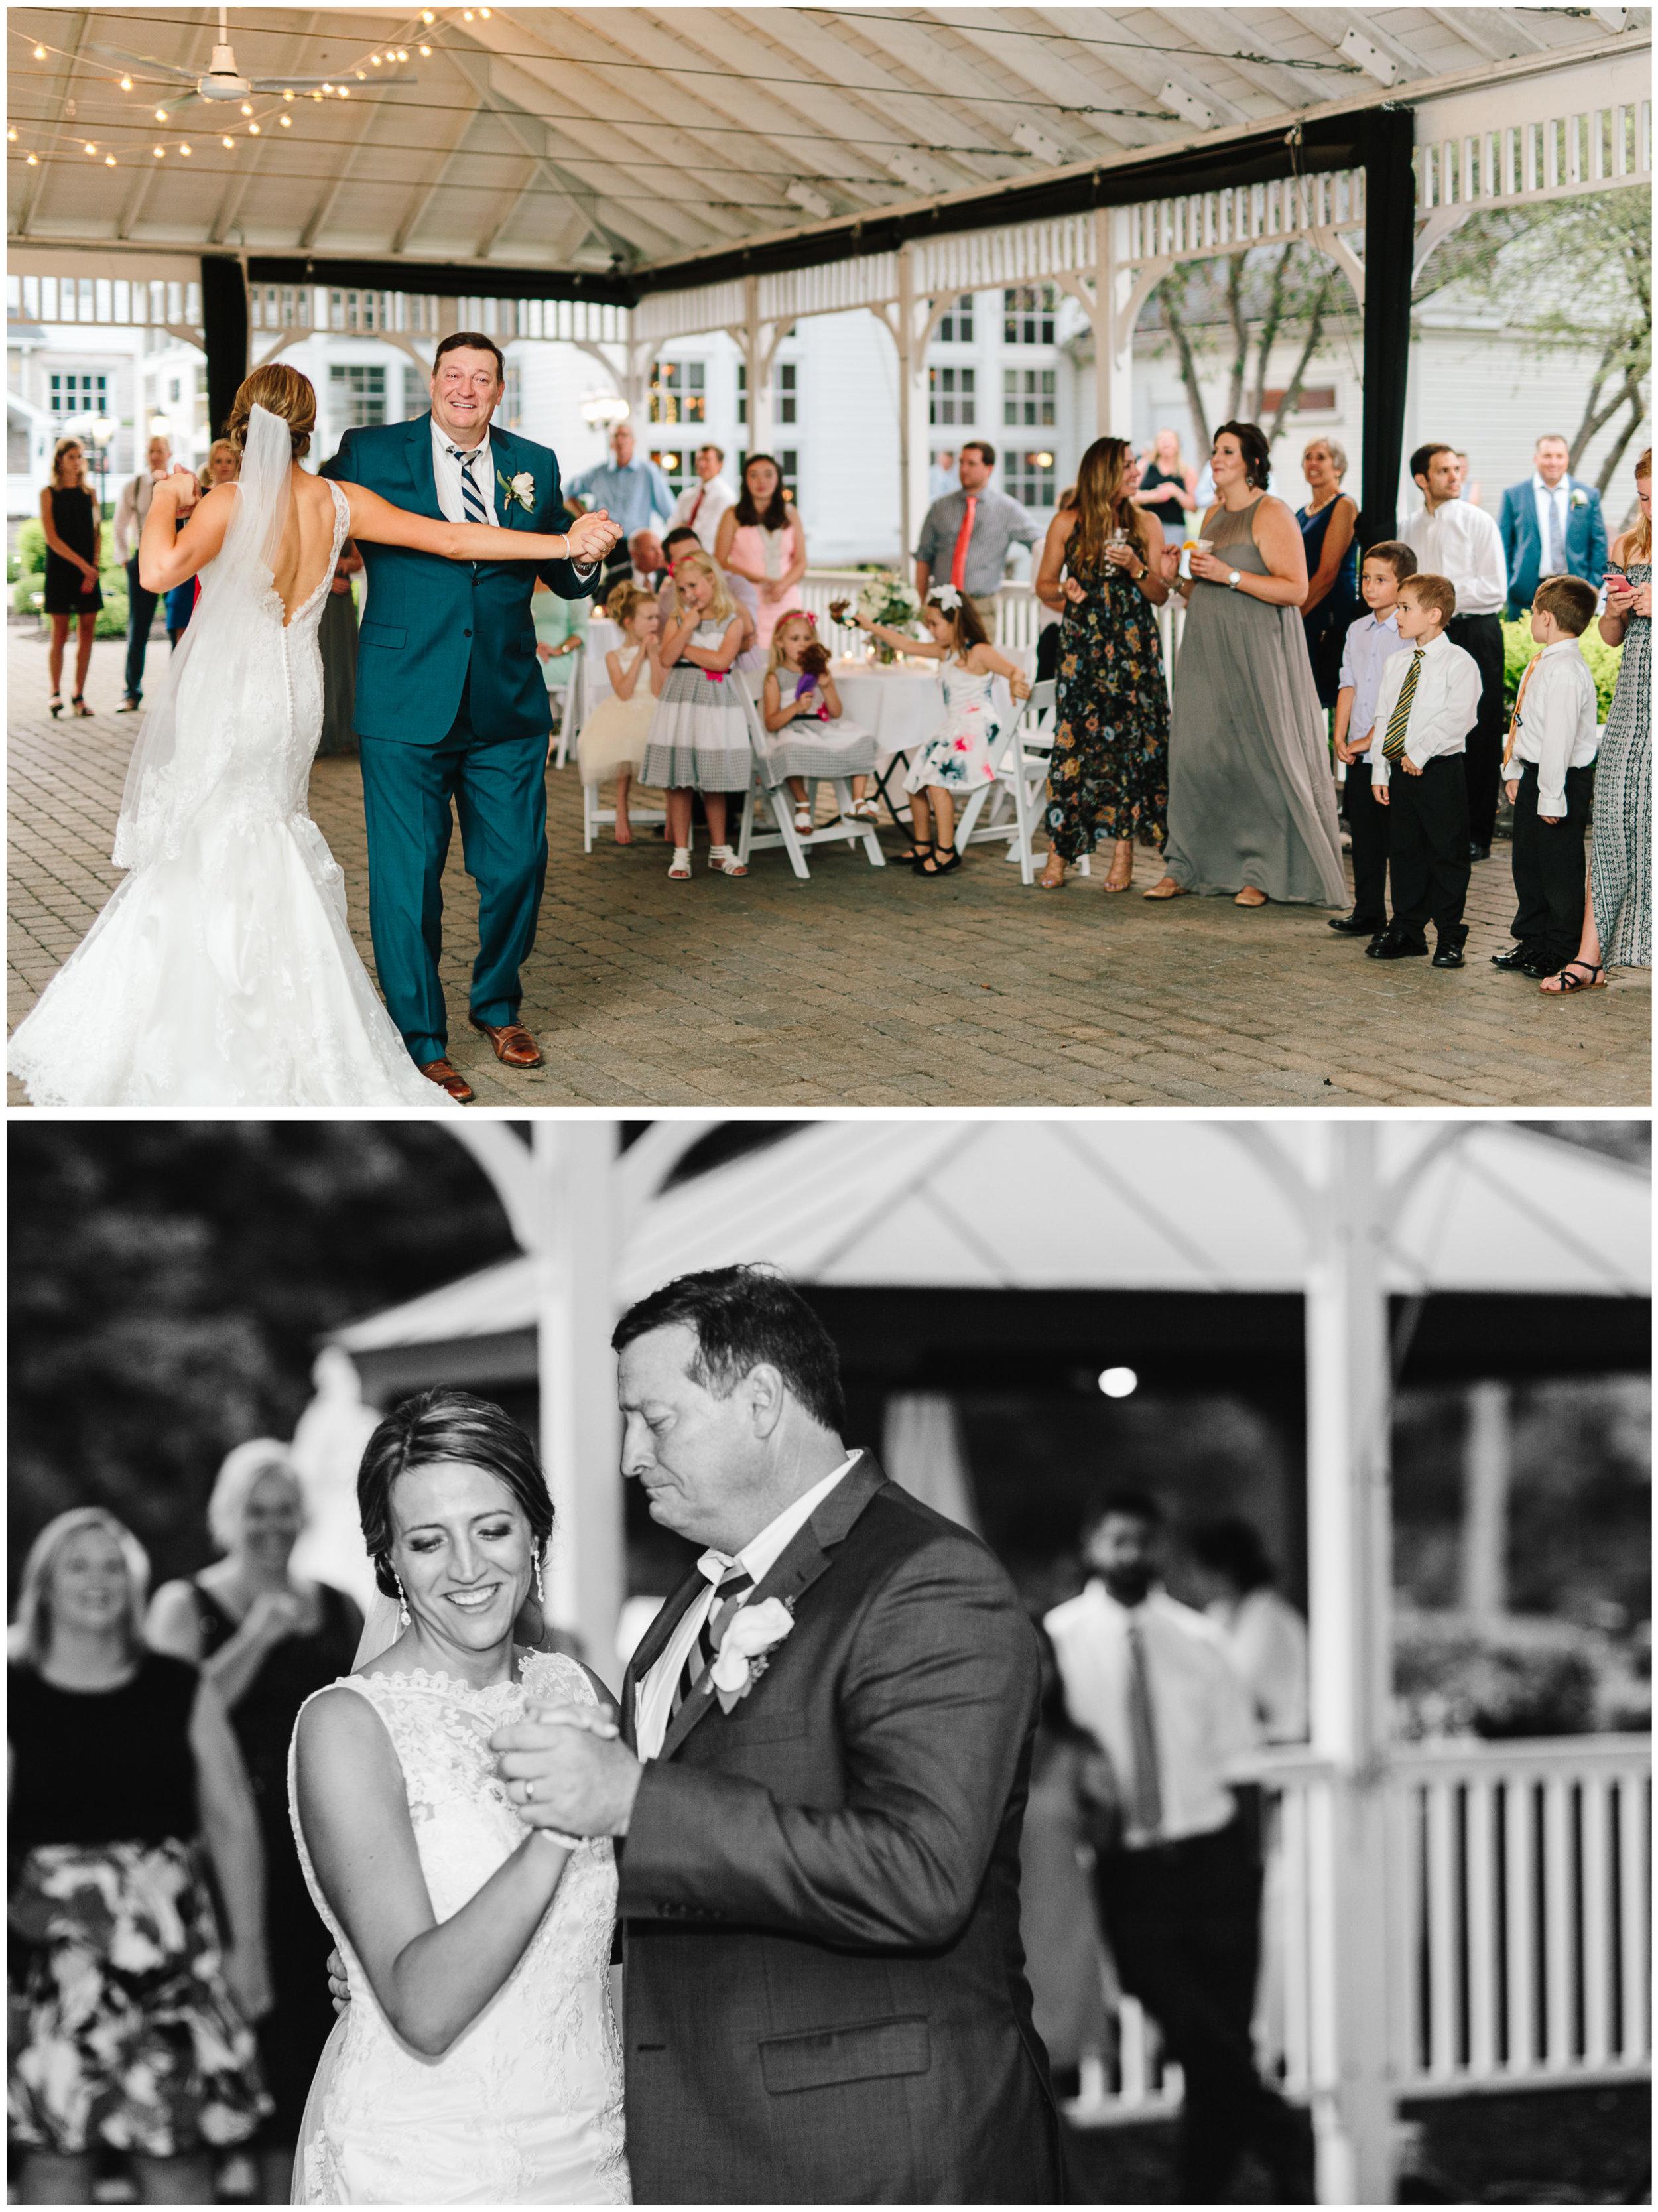 ann_arbor_michigan_wedding_91.jpg